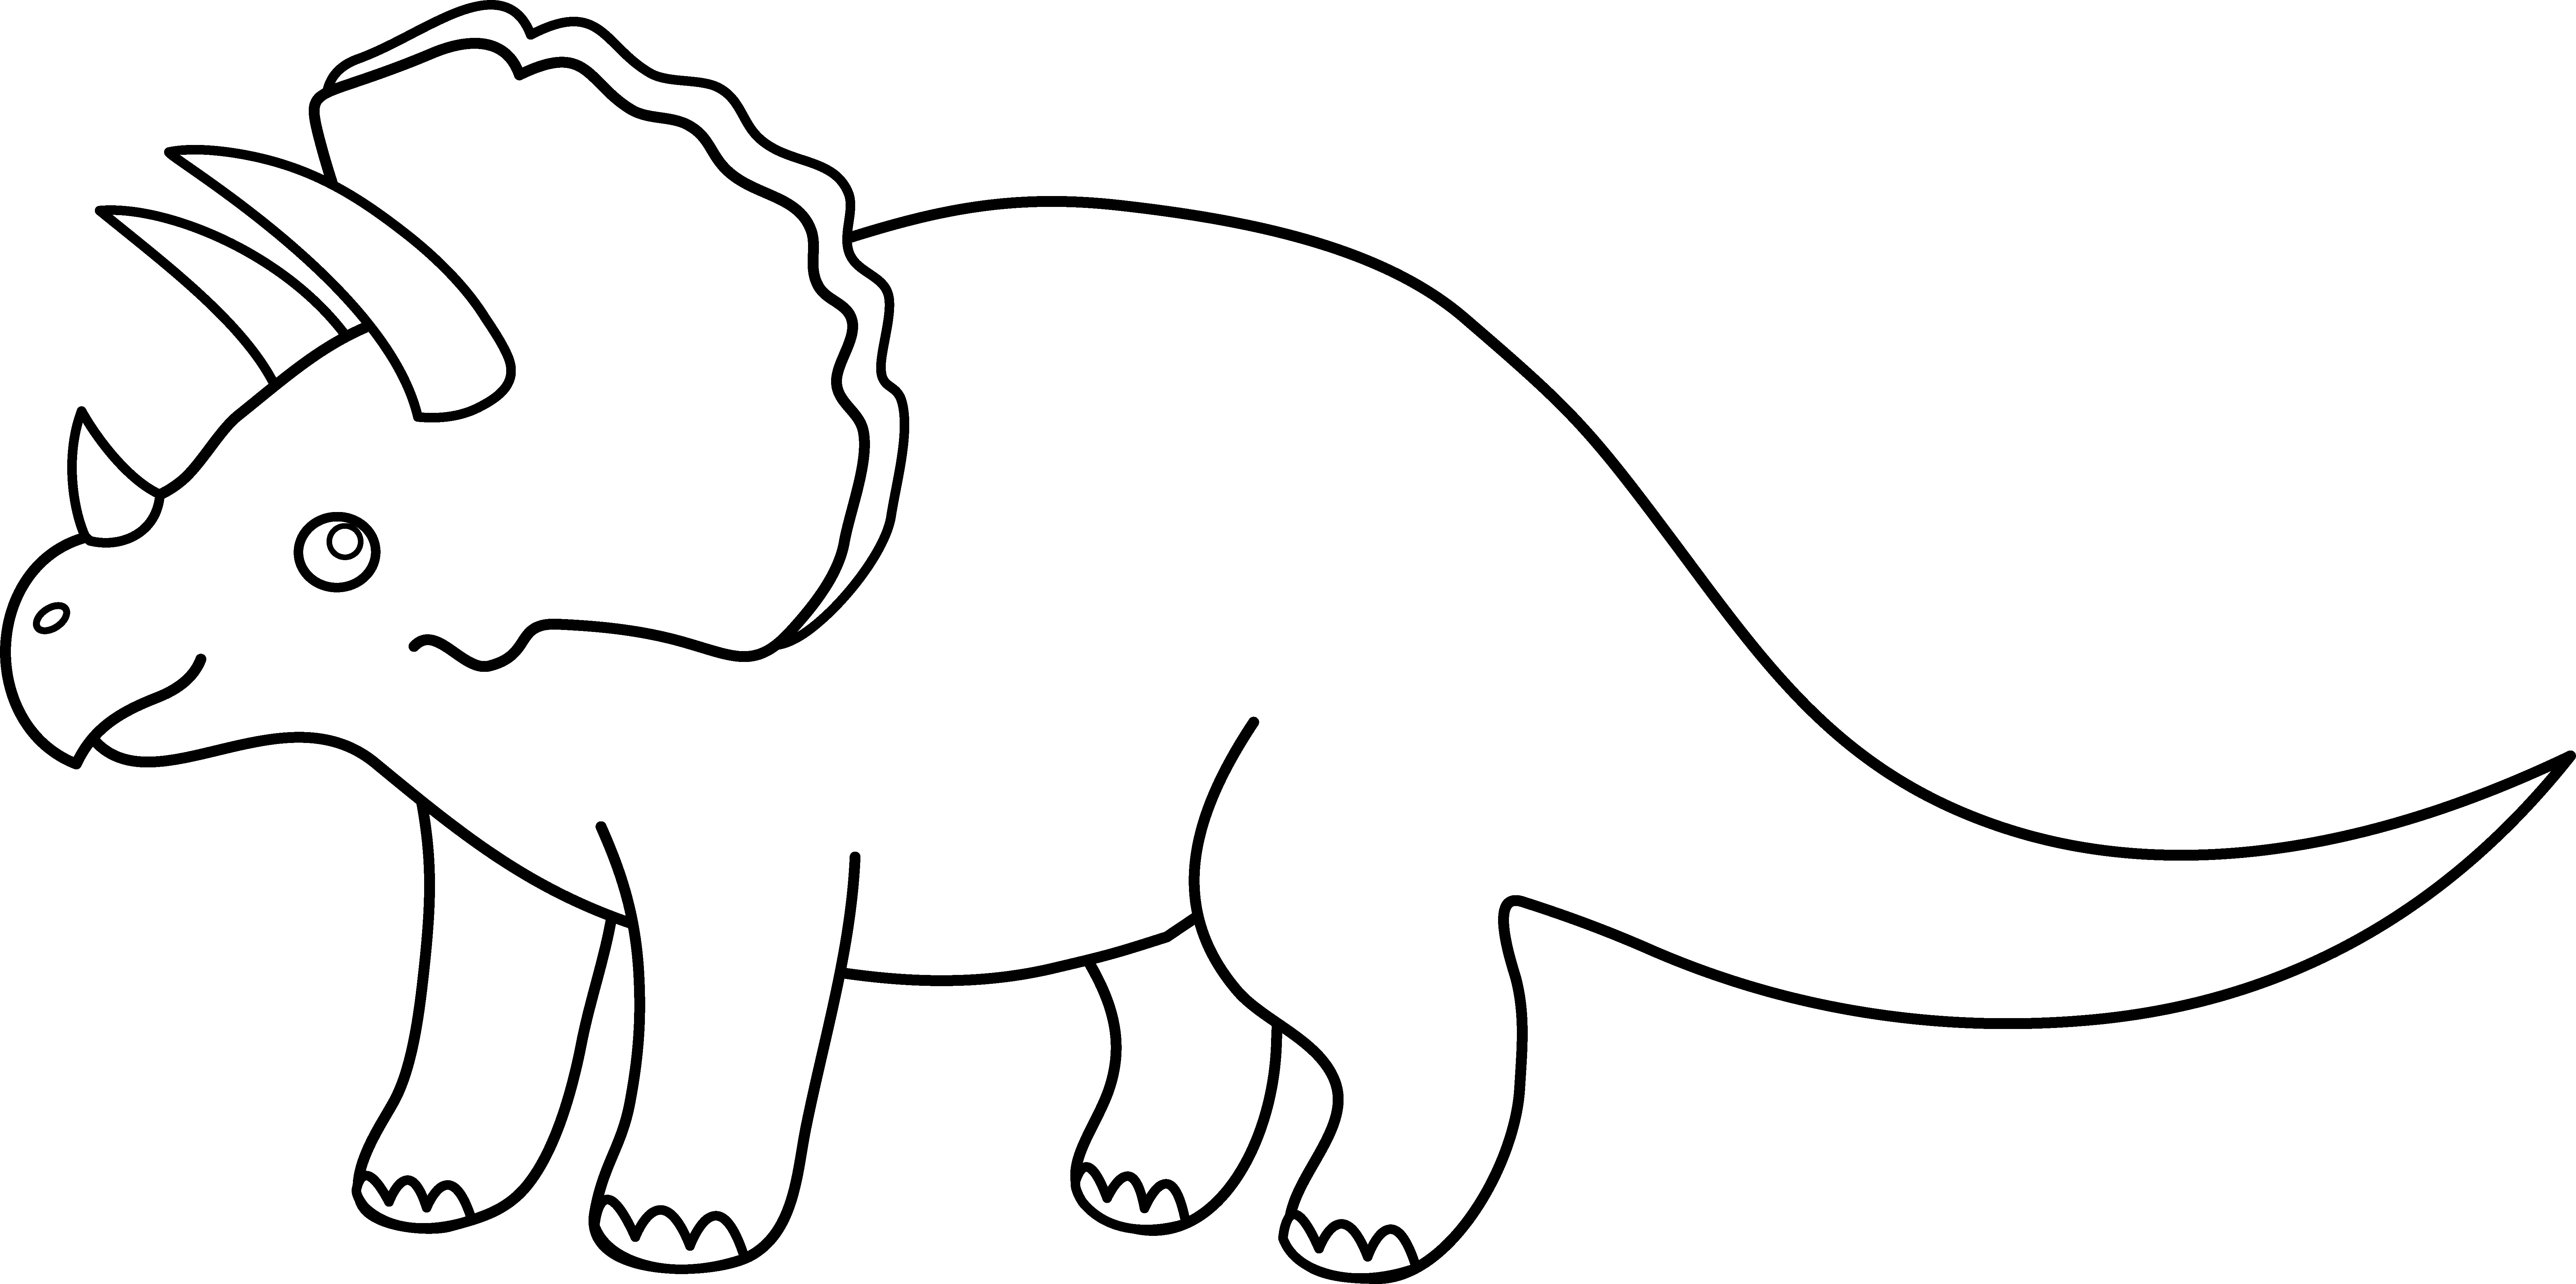 Skeleton outline free images. Clipart panda dinosaur